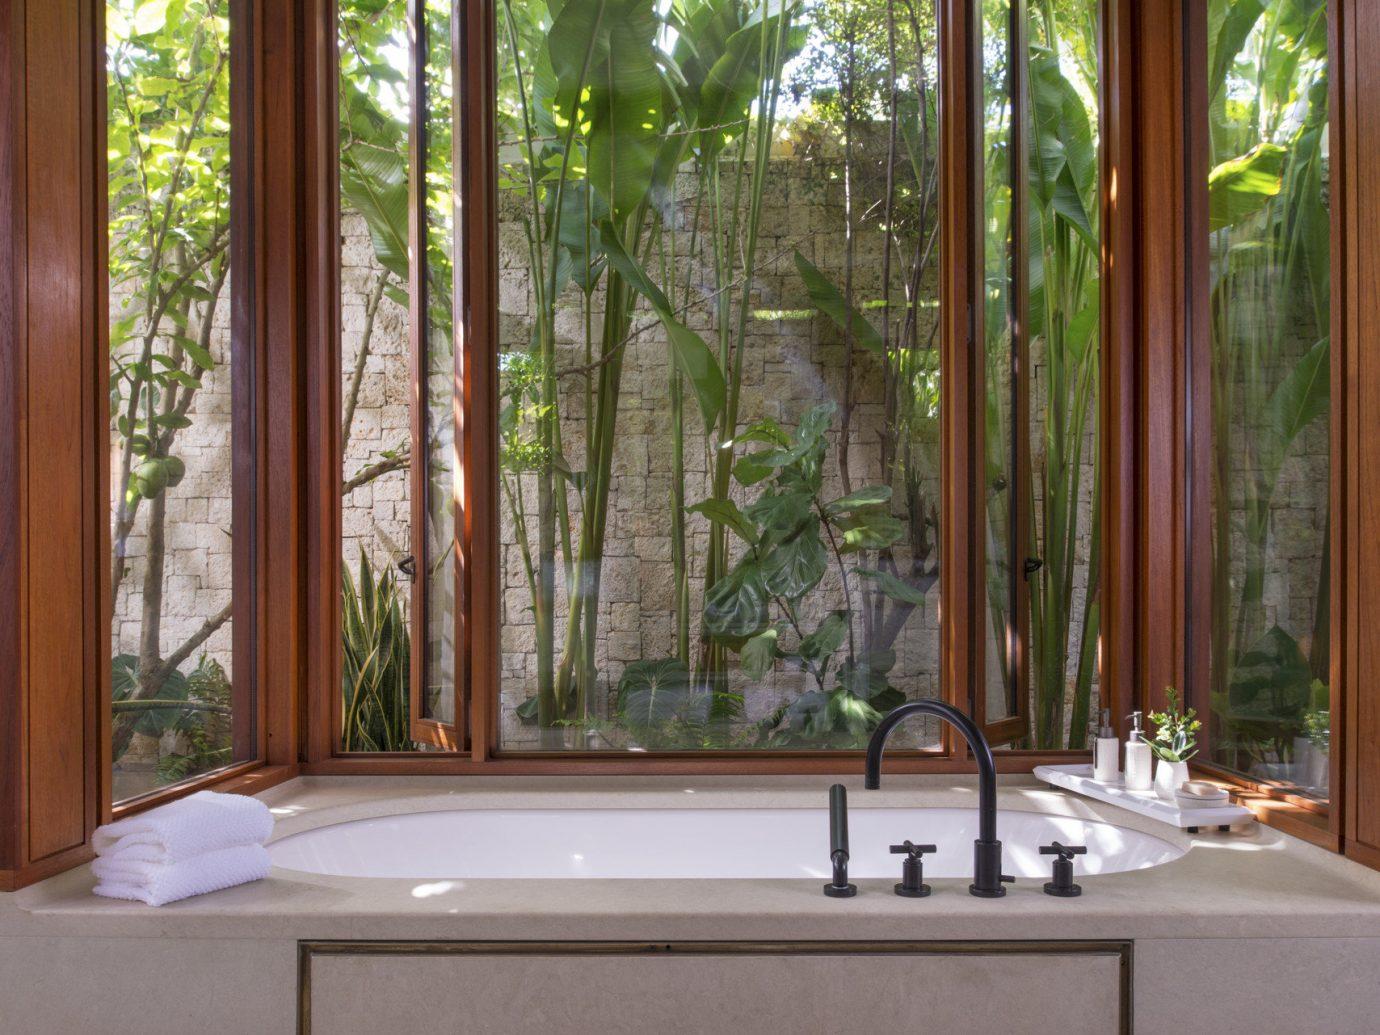 Bathtub At Amanera Luxury Resort In Playa Grande, Dominican Republic